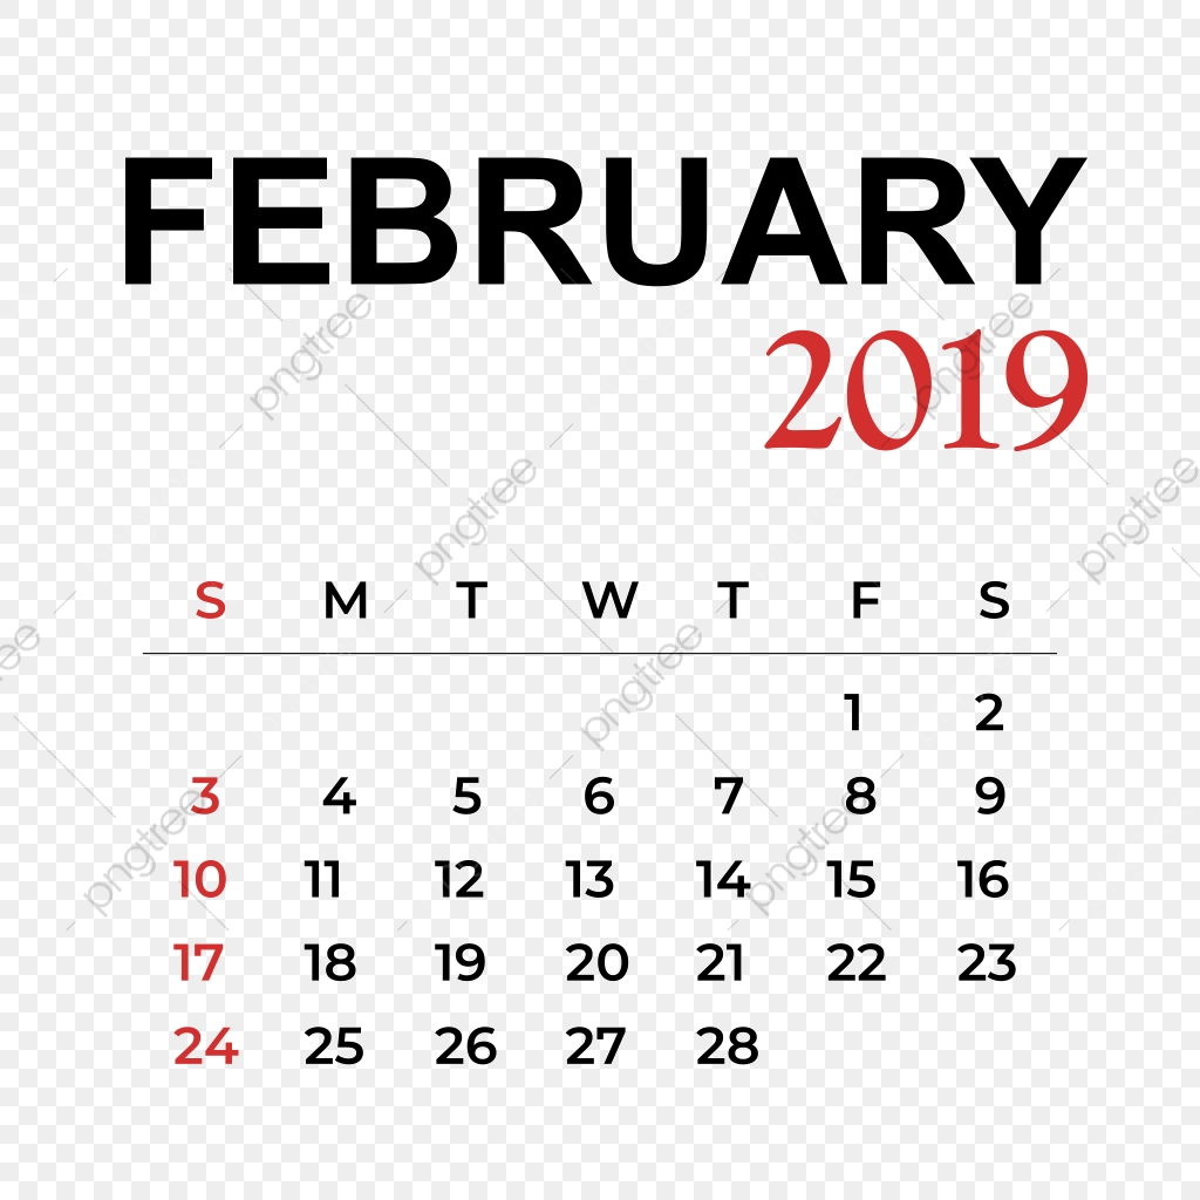 Febrero 2019 Calendario.Calendario Mes De Febrero 2019 Calendario Vector Ano Png Y Vector